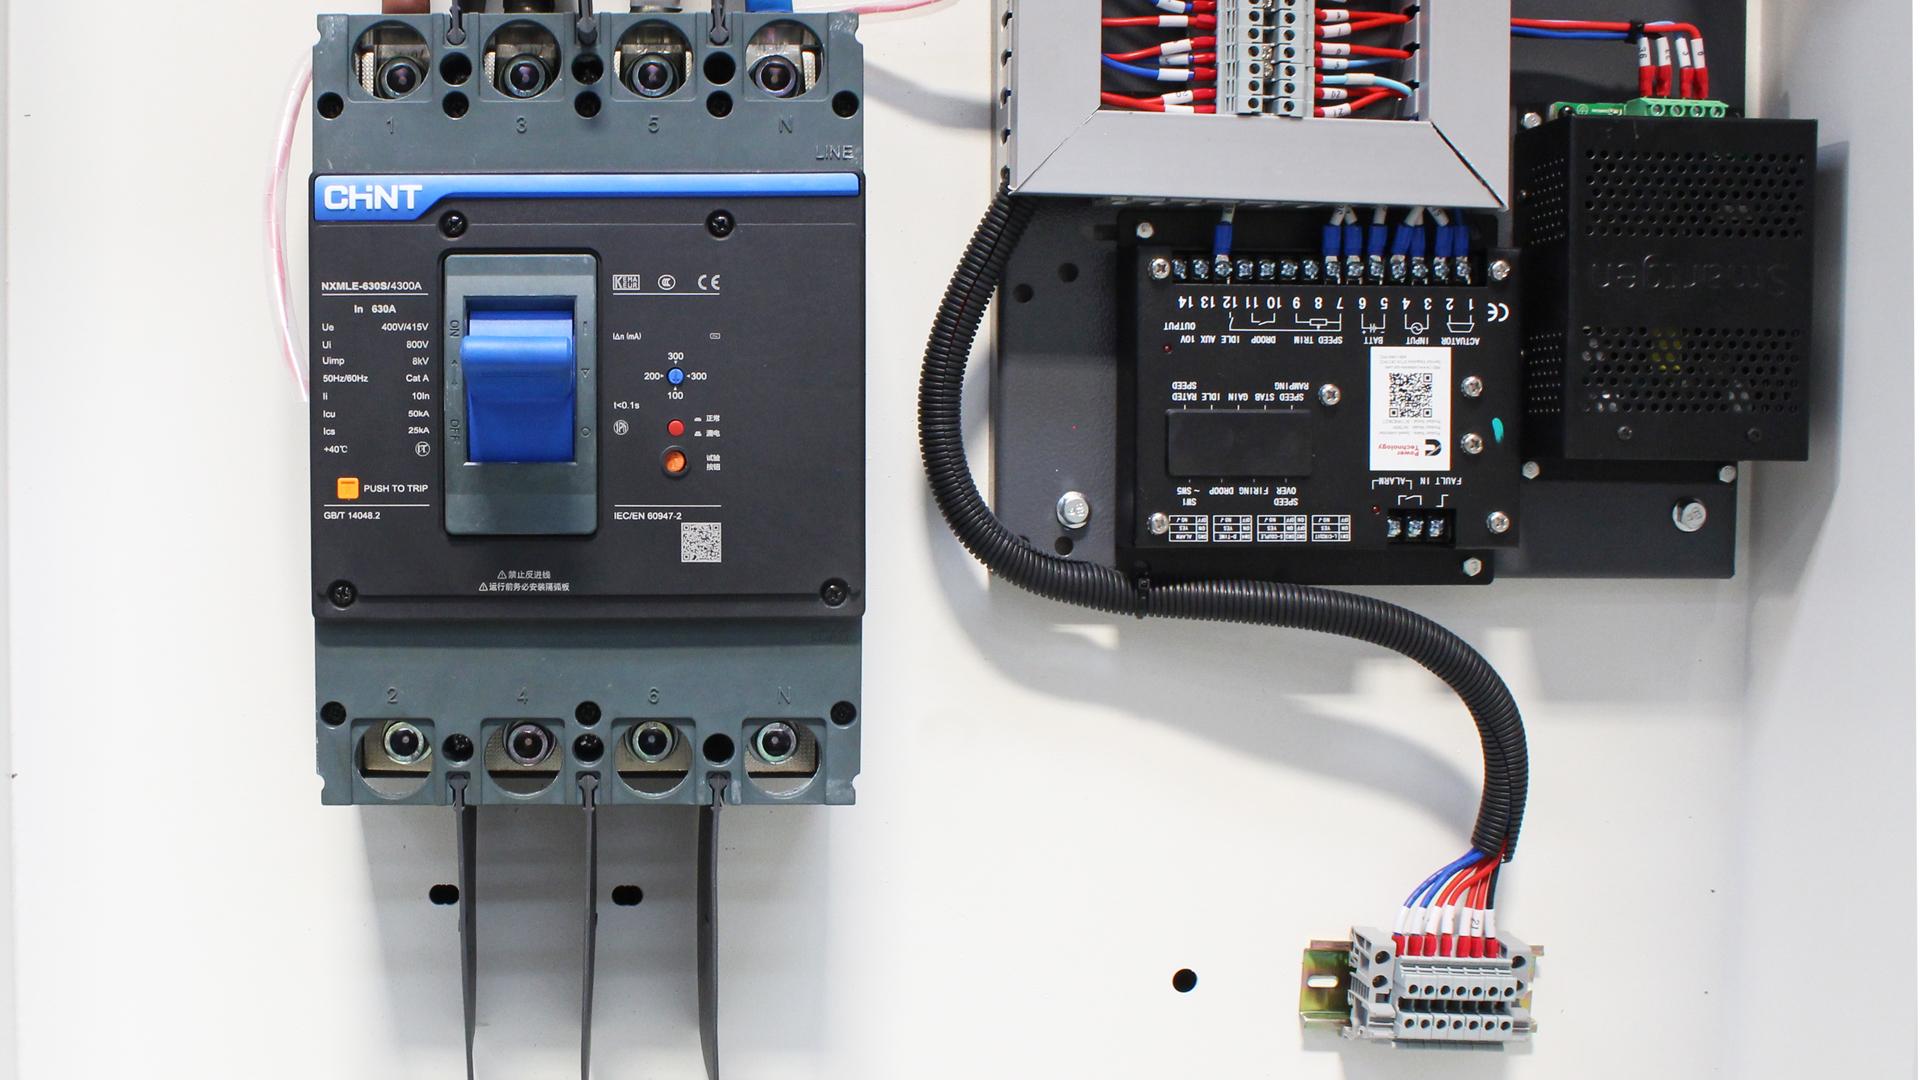 CHiNT breakers used on Evopower Cummins powered generators